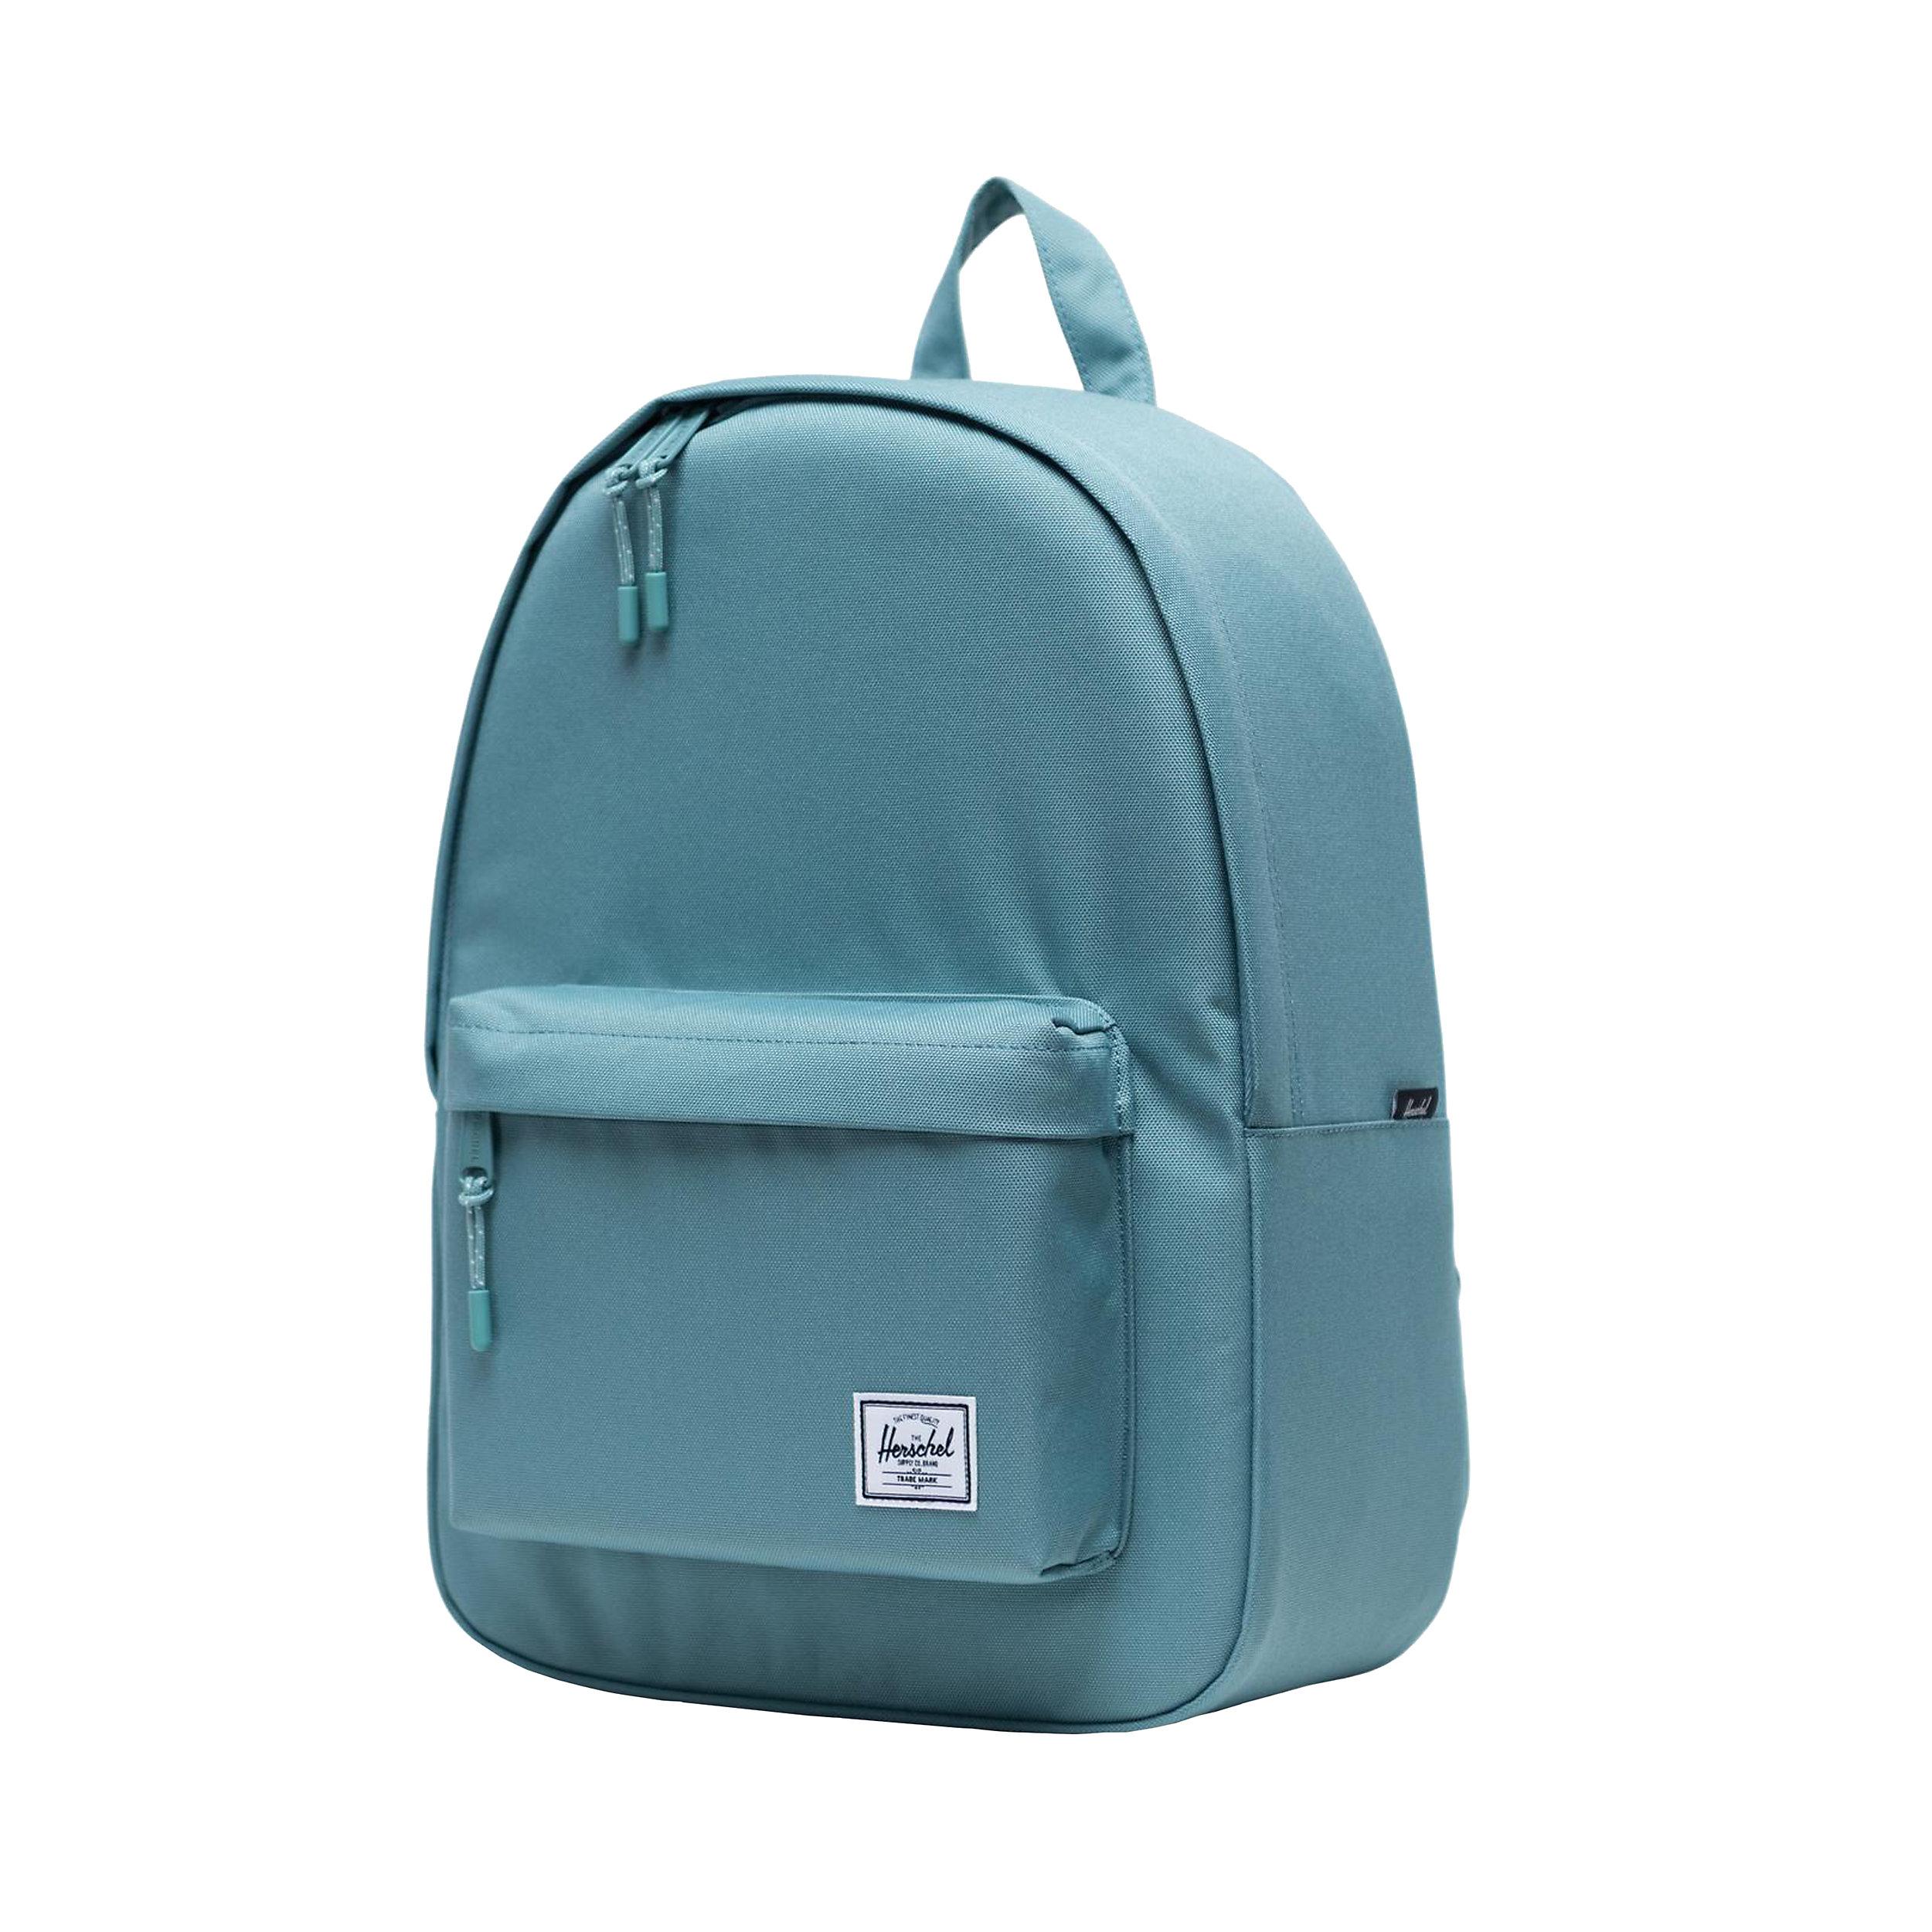 "Backpack Classic Mid-Volume 13"" Classics Mid Backpacks 18 Liter"